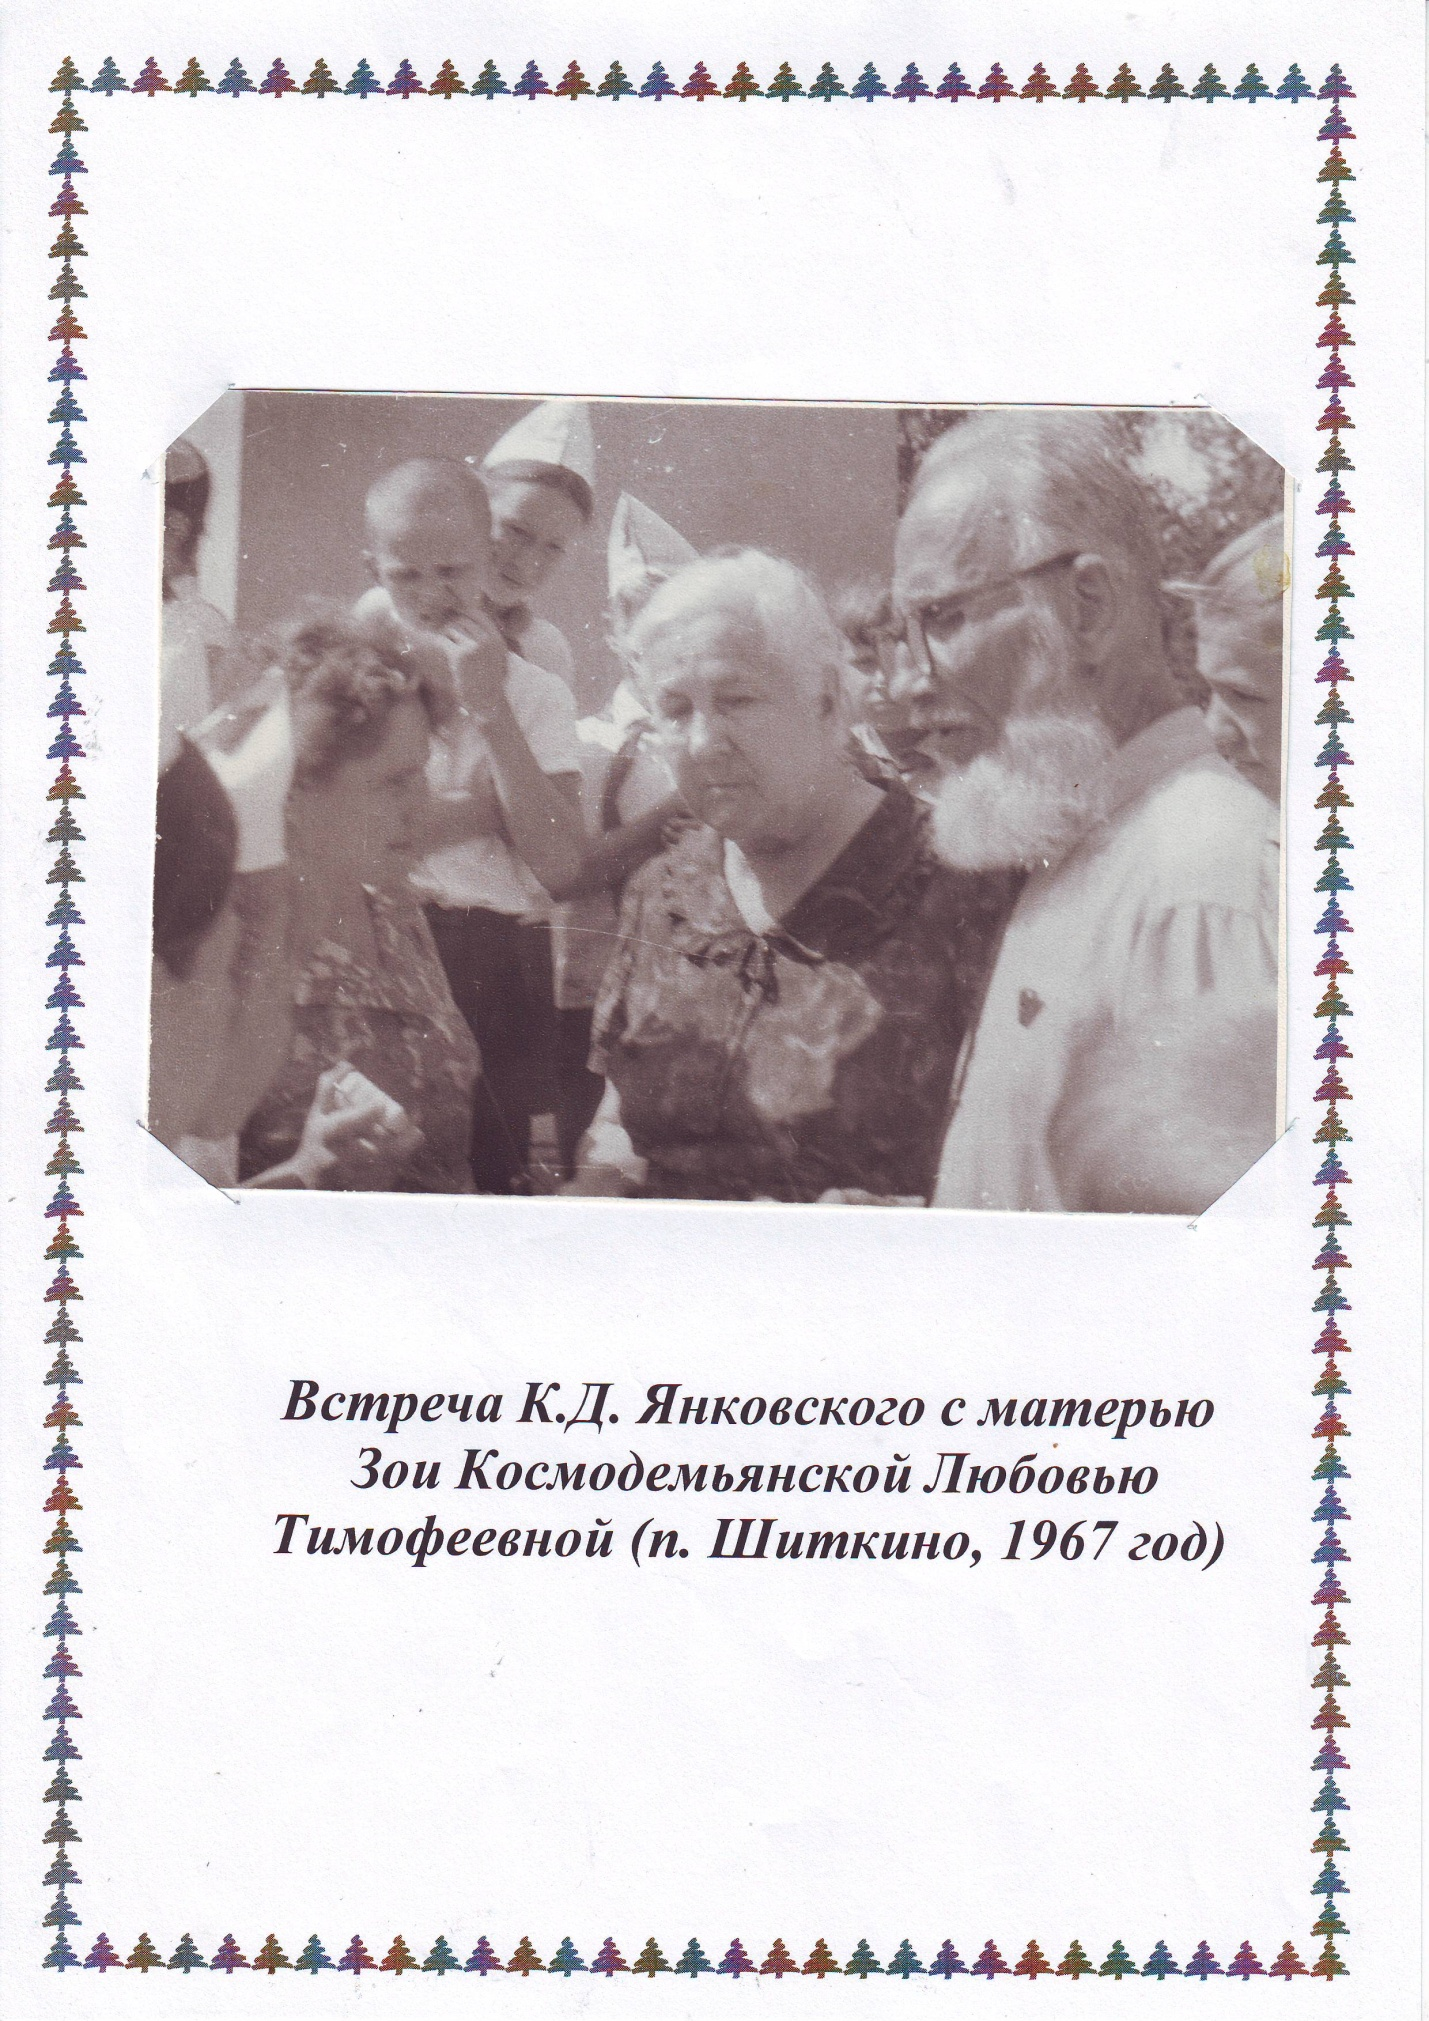 H:\Конкурсы\К.Д. Янковский\Янковский\Image0015.JPG